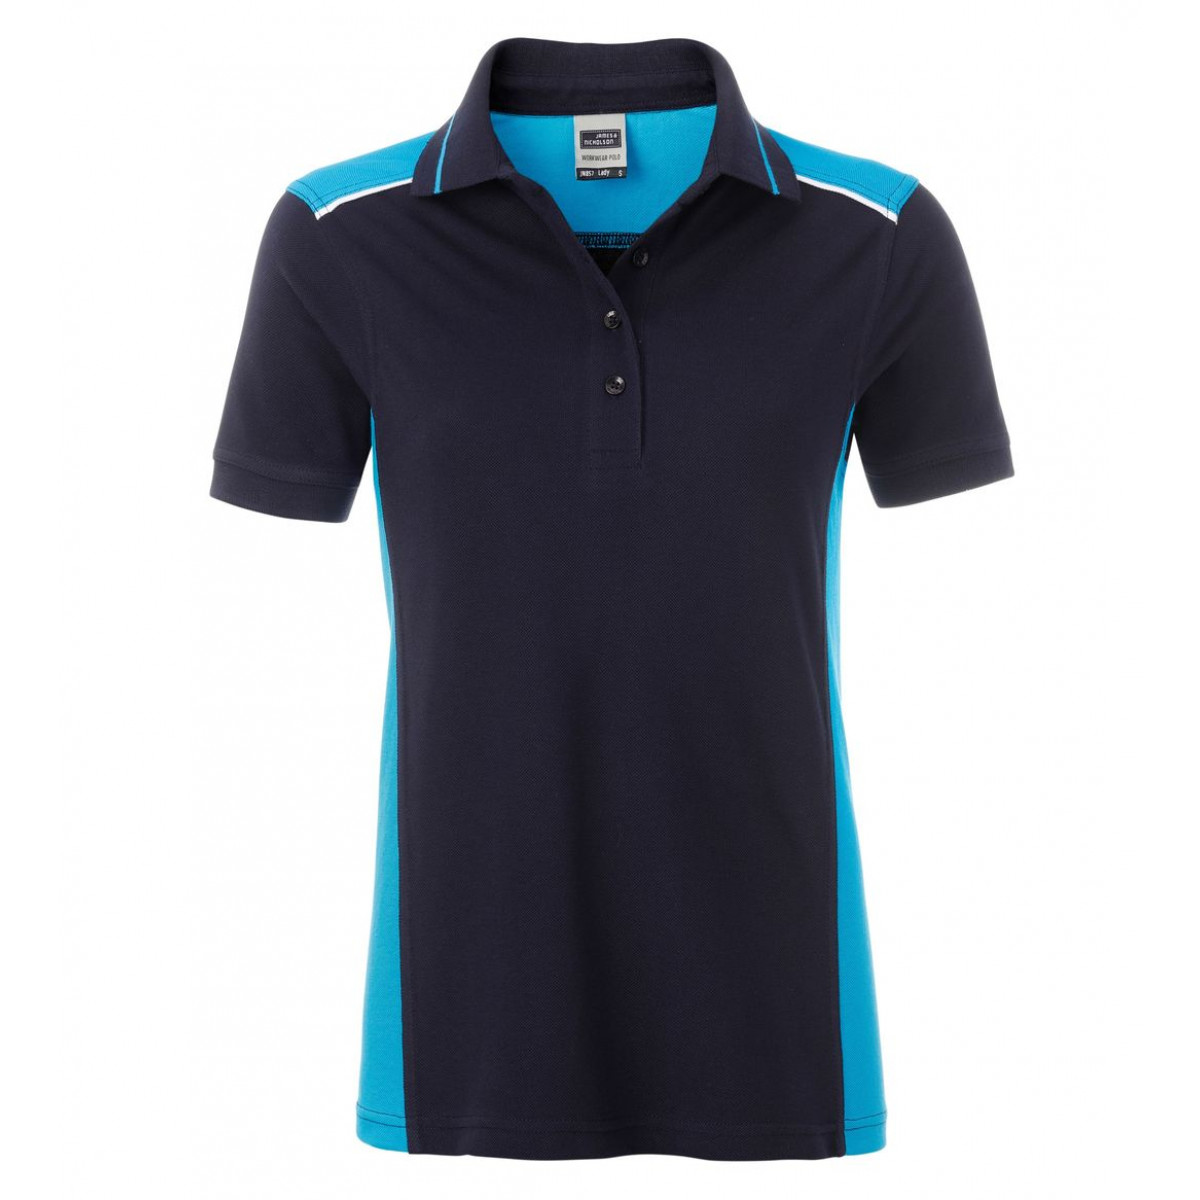 Рубашка поло женская JN857 Ladies Workwear Polo-Level 2 - Темно-синий/Бирюзовый